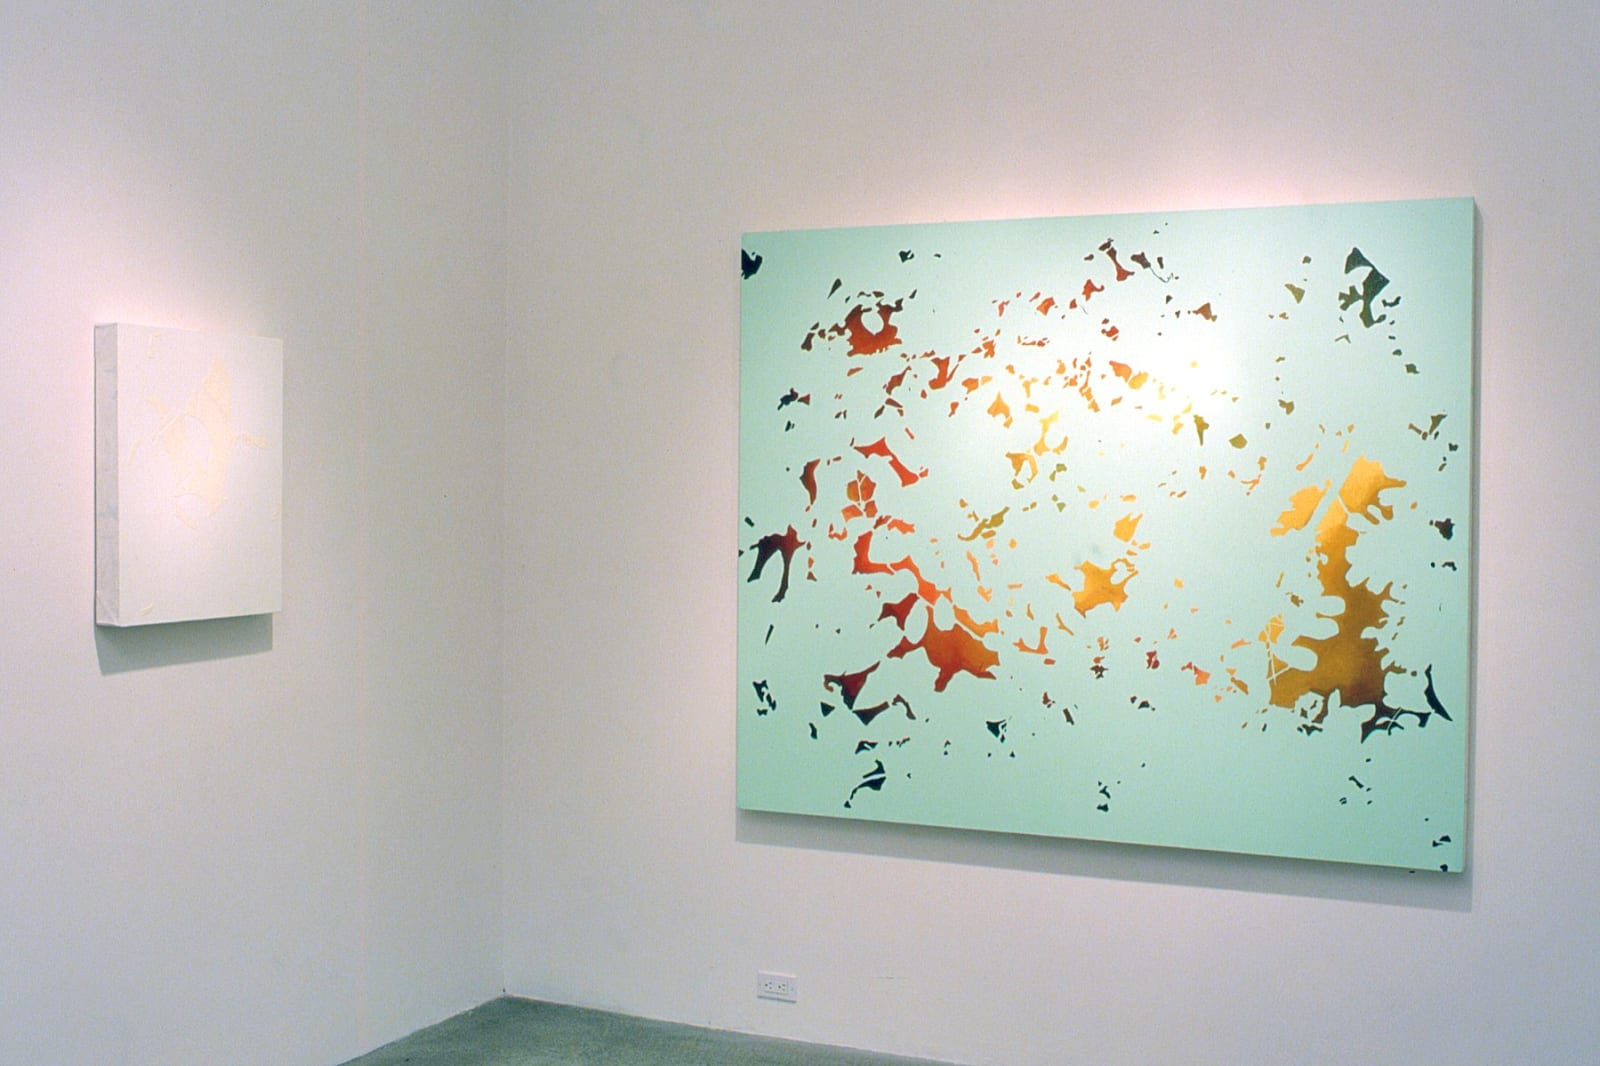 Stephen P. Curry | Constellation